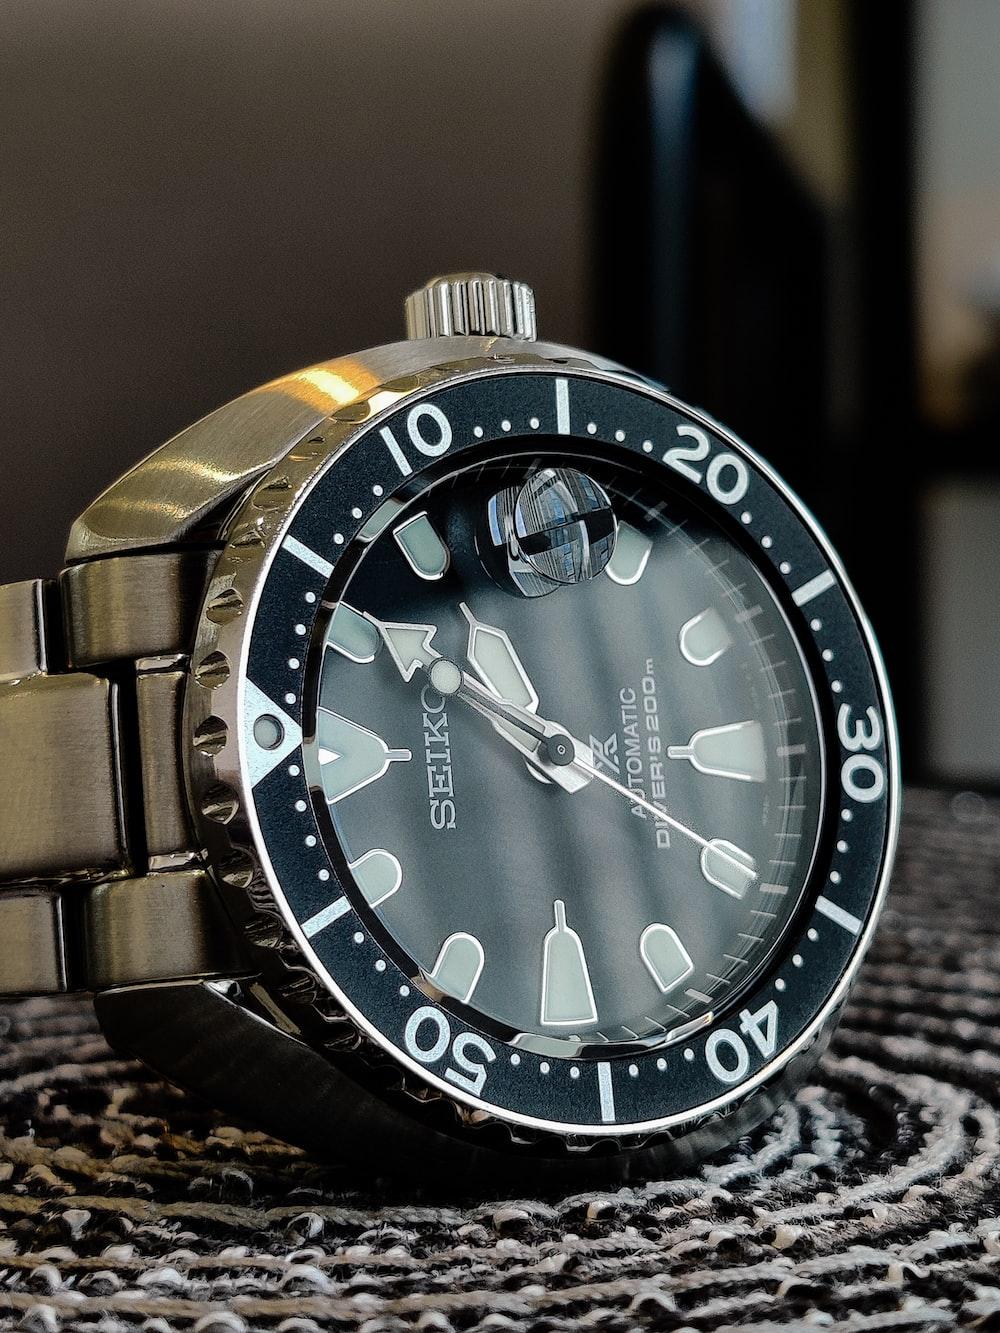 round silver-colored Seiko analog watch